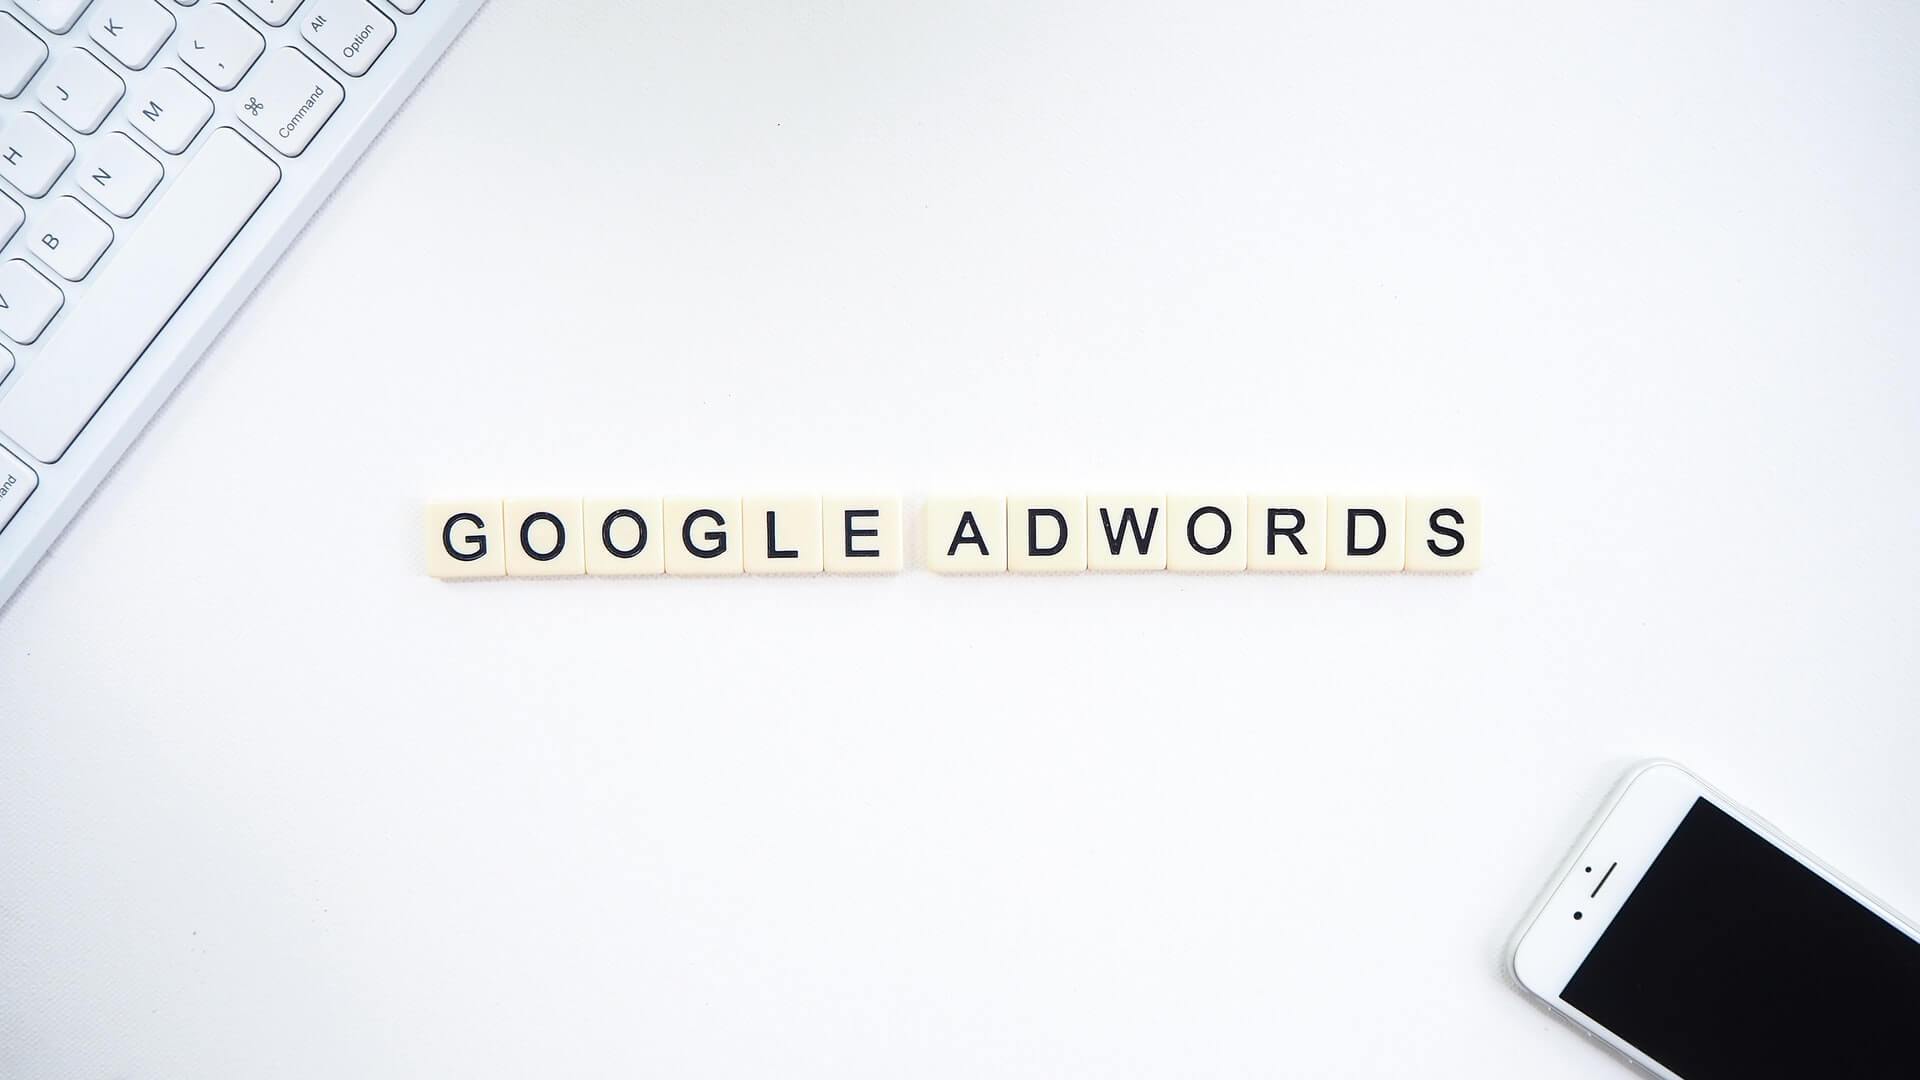 Ggoogle adwords text